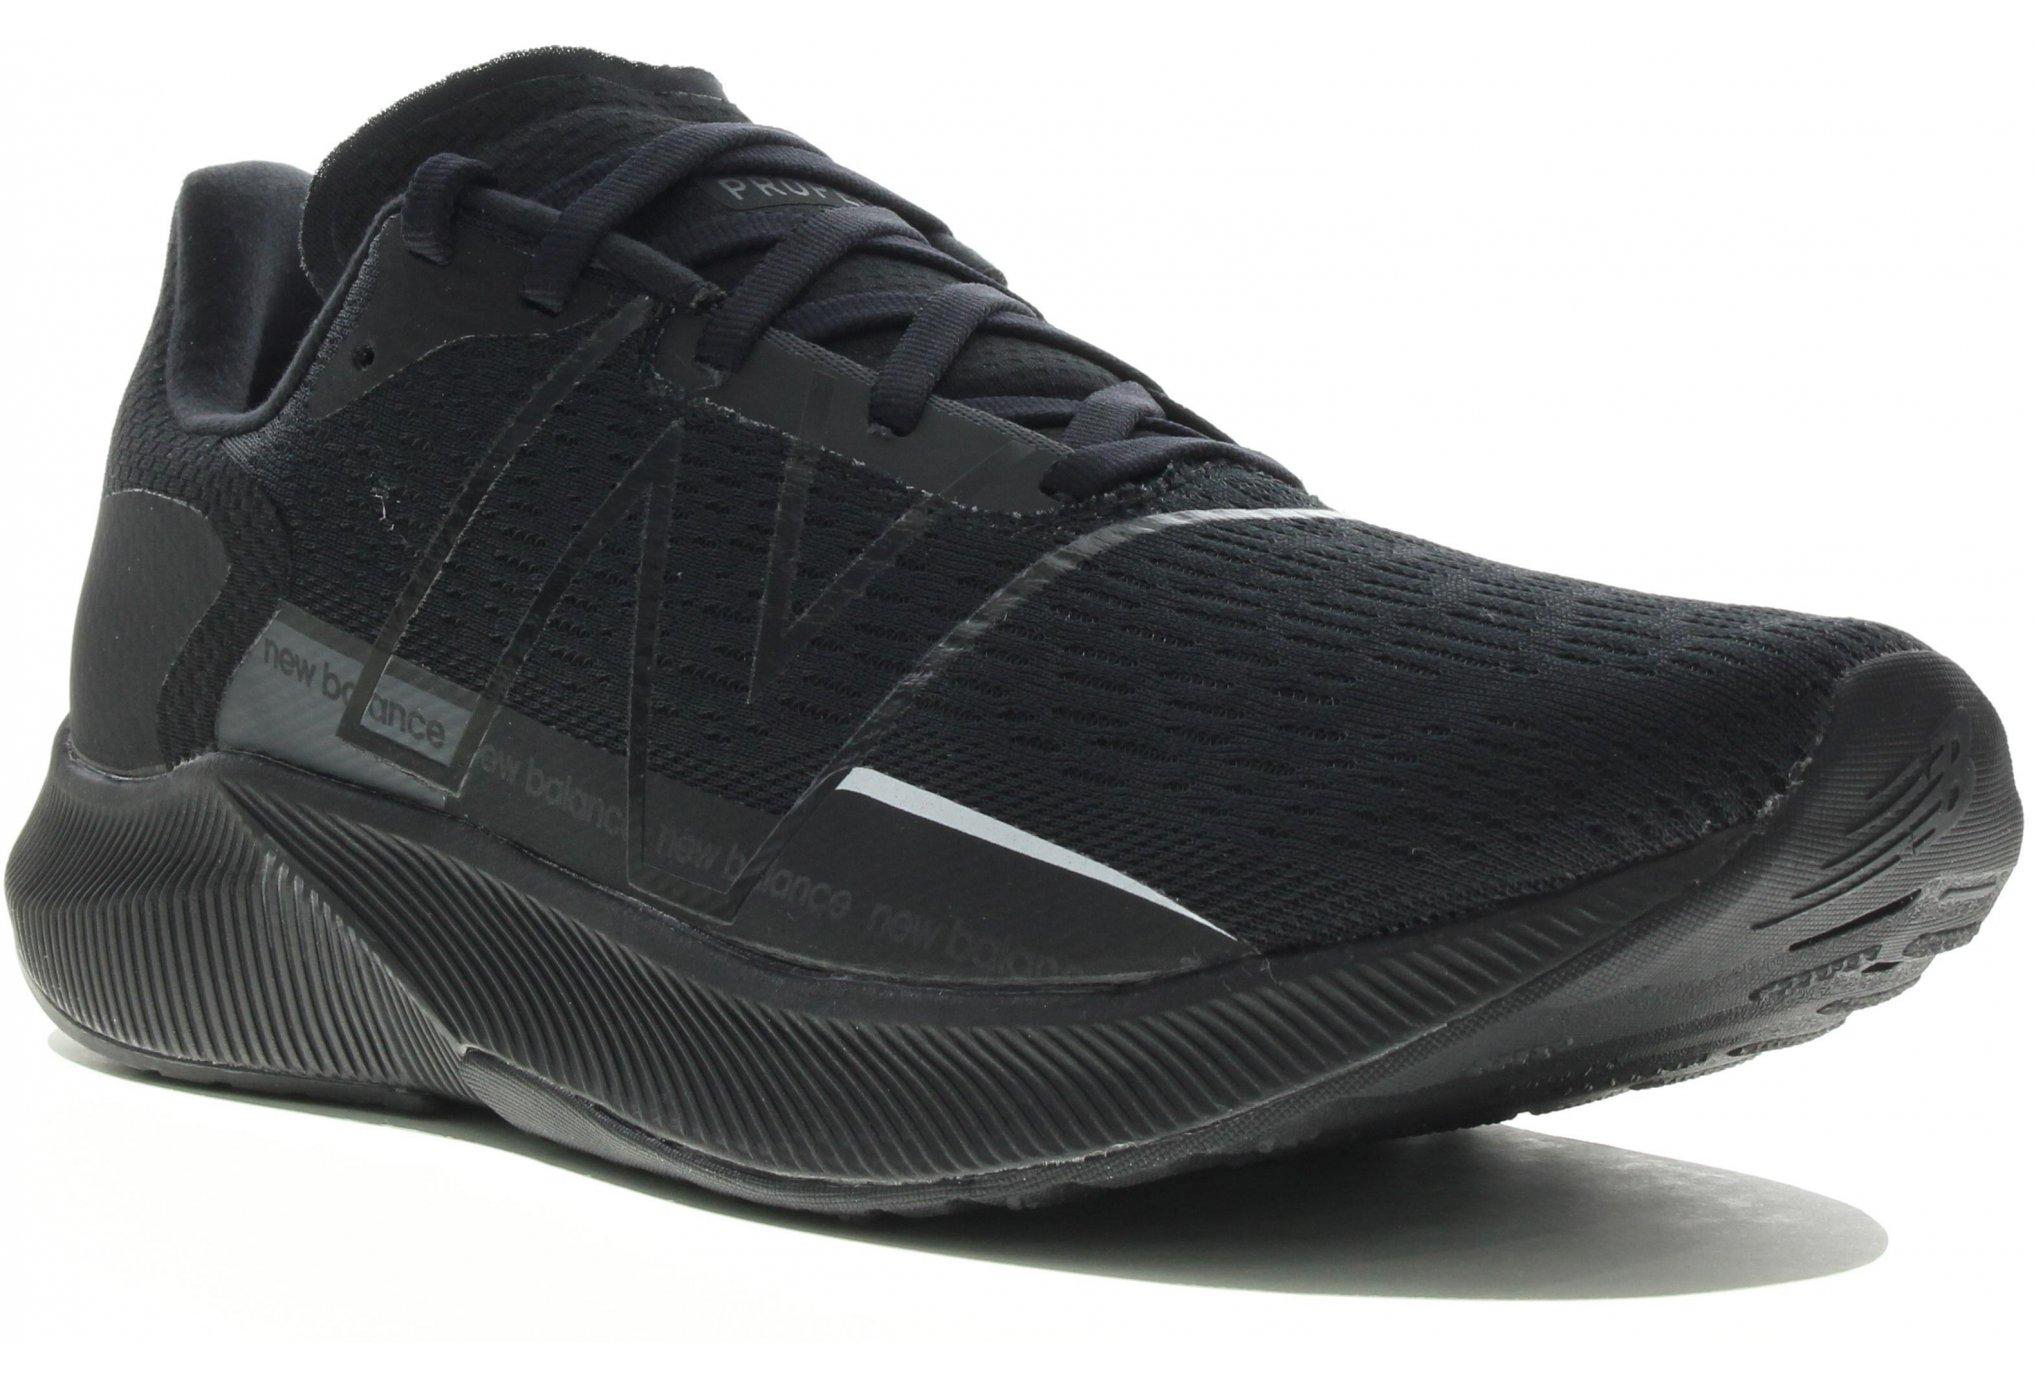 New Balance FuelCell Propel V2 M Diététique Chaussures homme